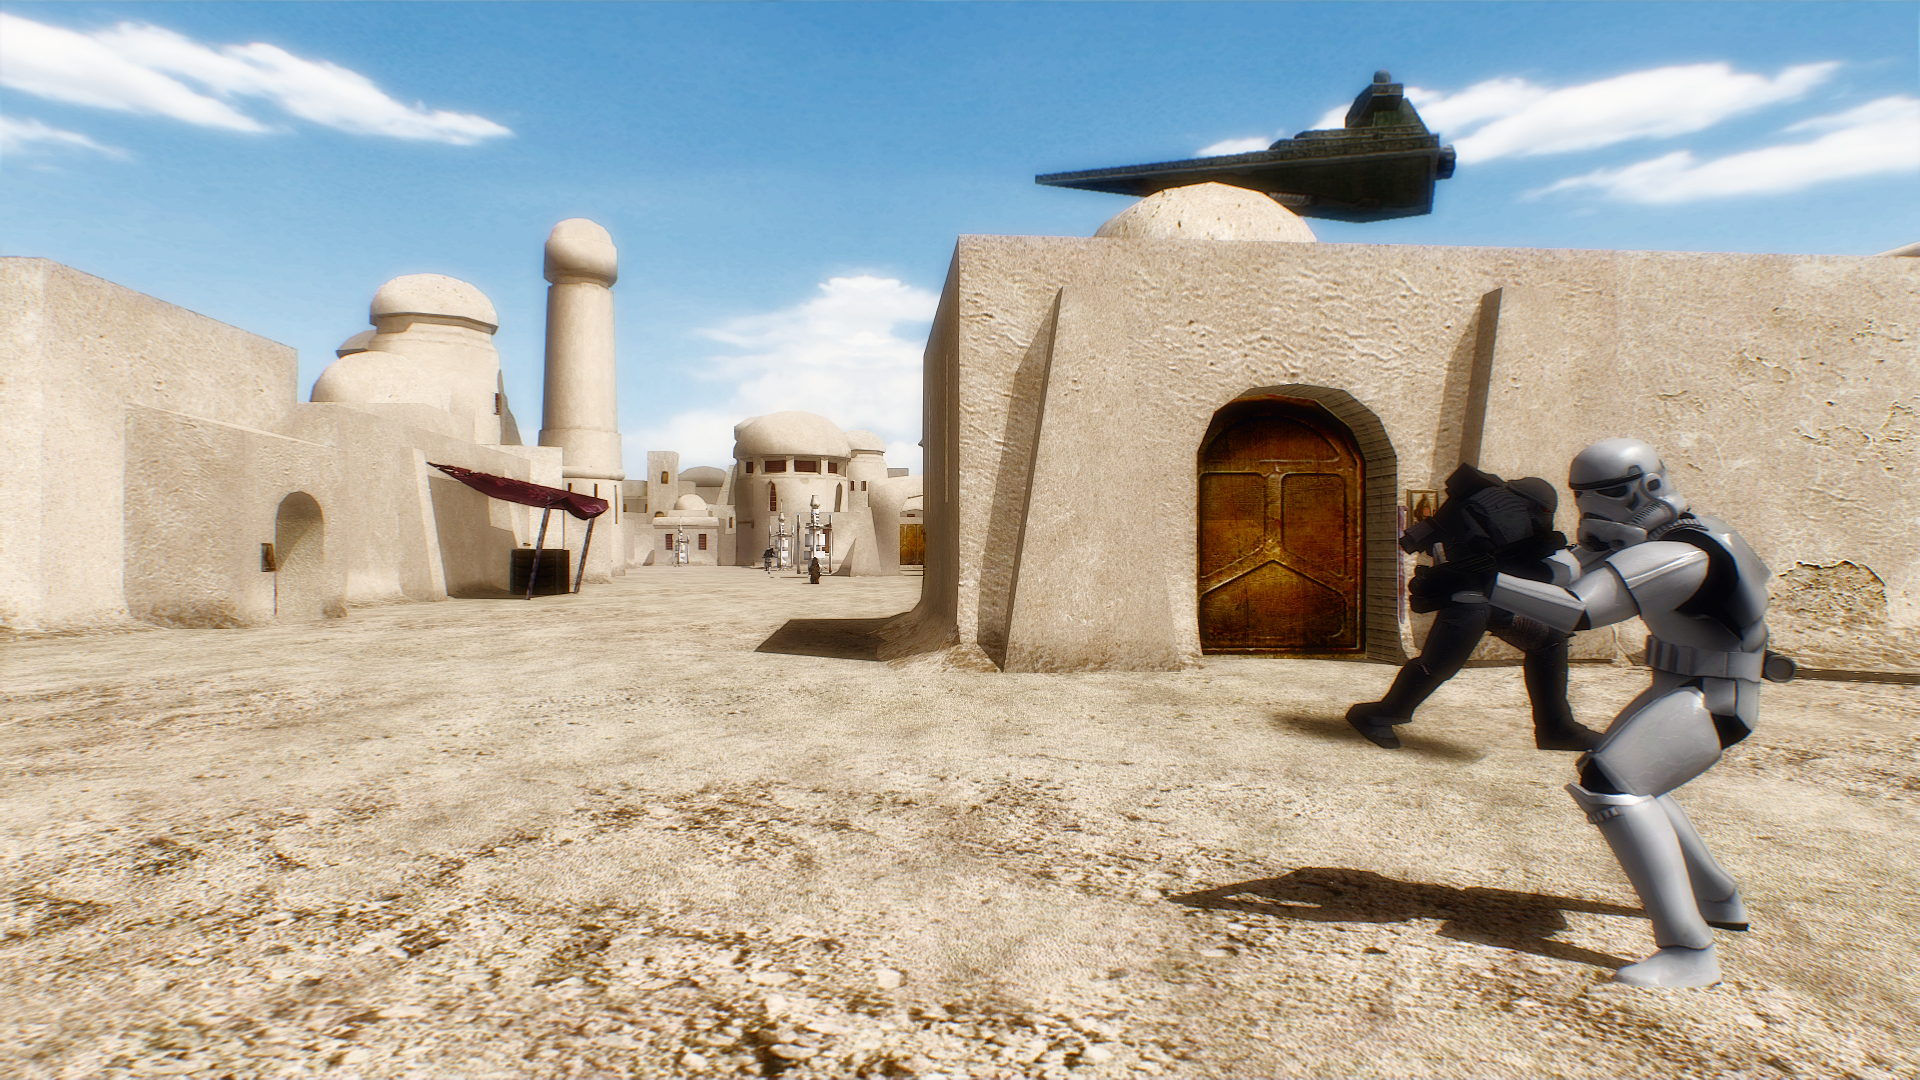 Tatooine Mos Eisley Battlefront 2 HD